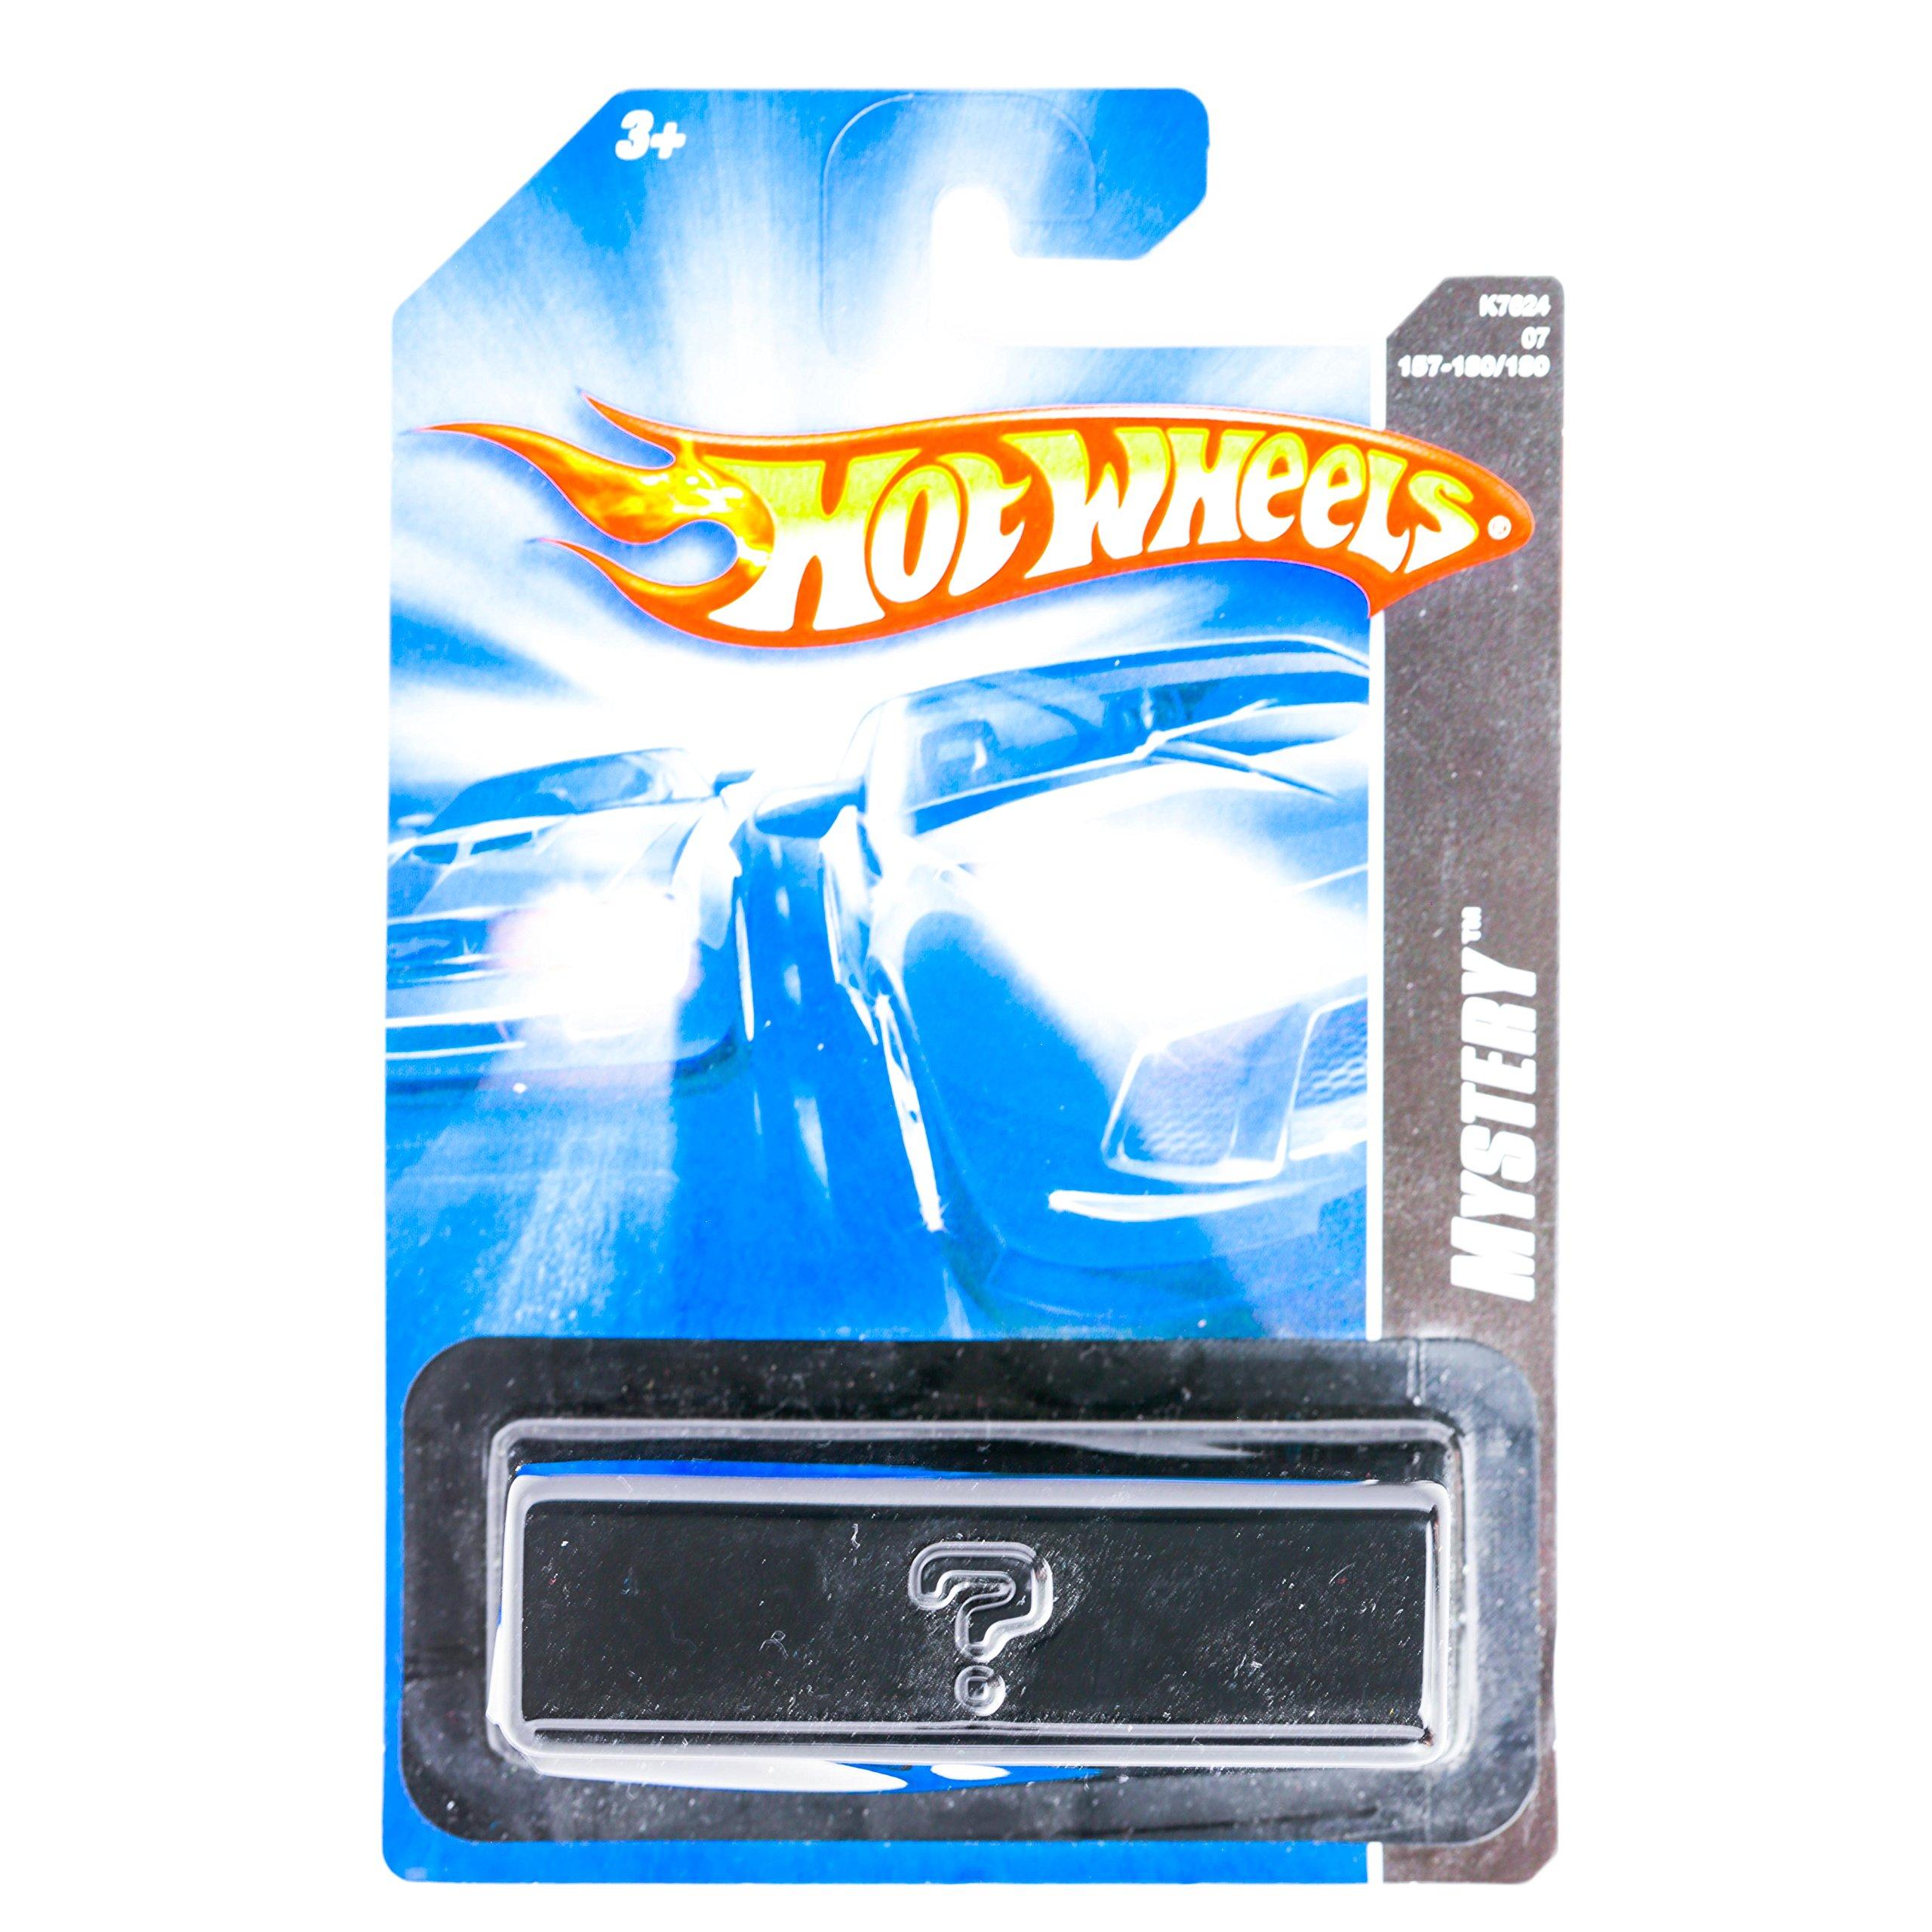 Hot Wheels 2007 Mystery Car 157-180